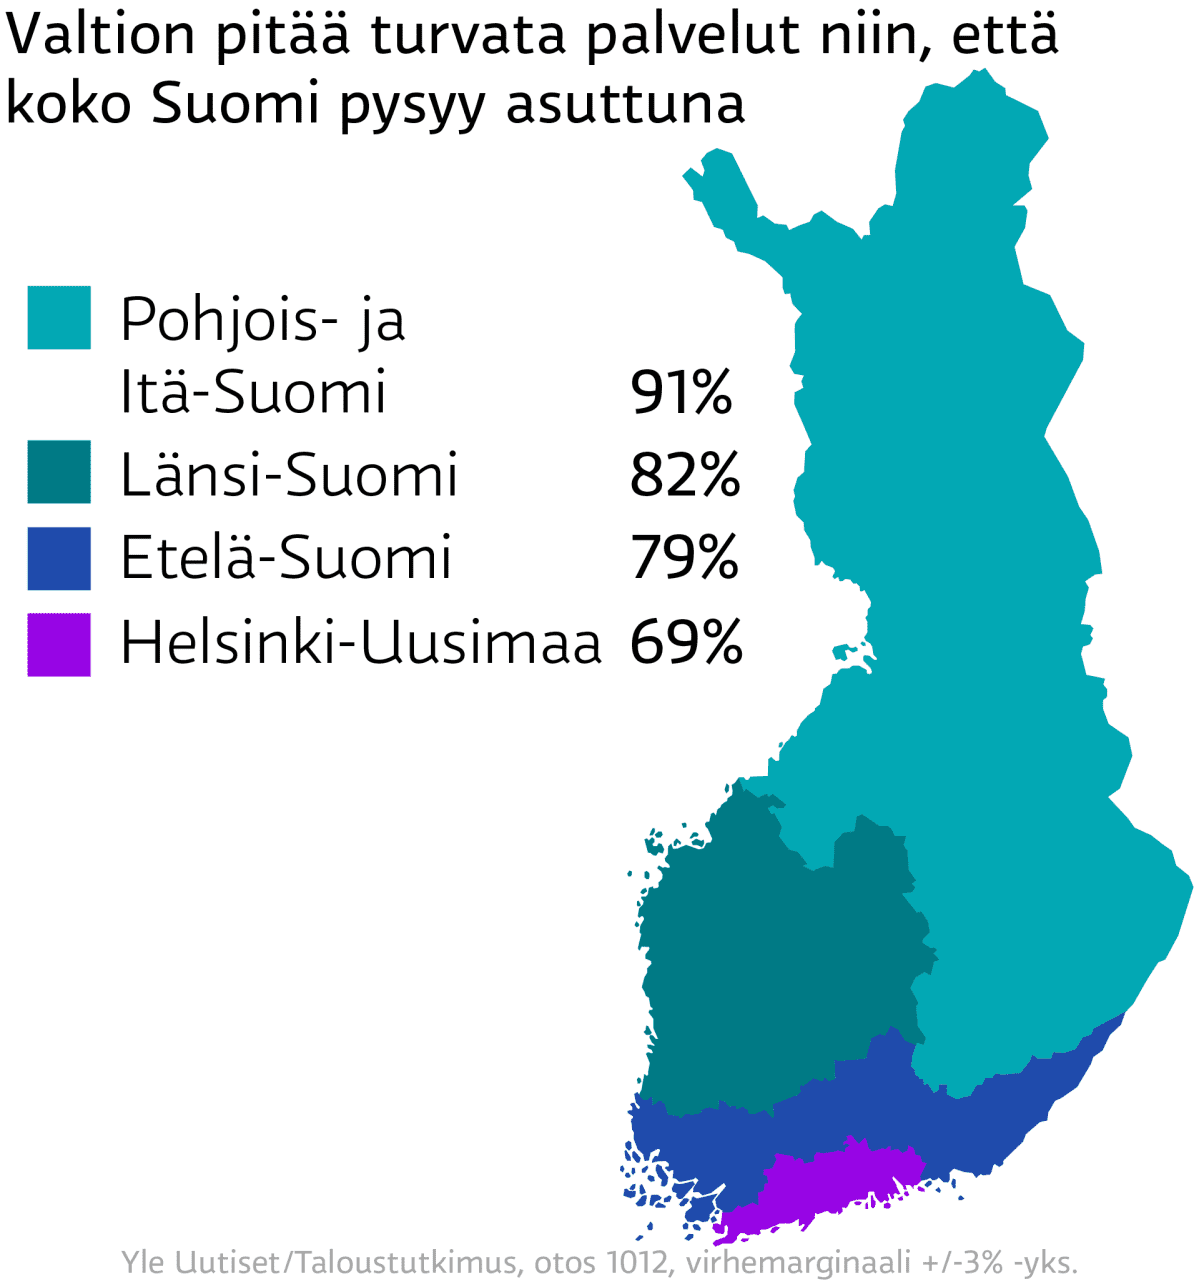 Suomi asuttuna / alueittain / Mediadeski